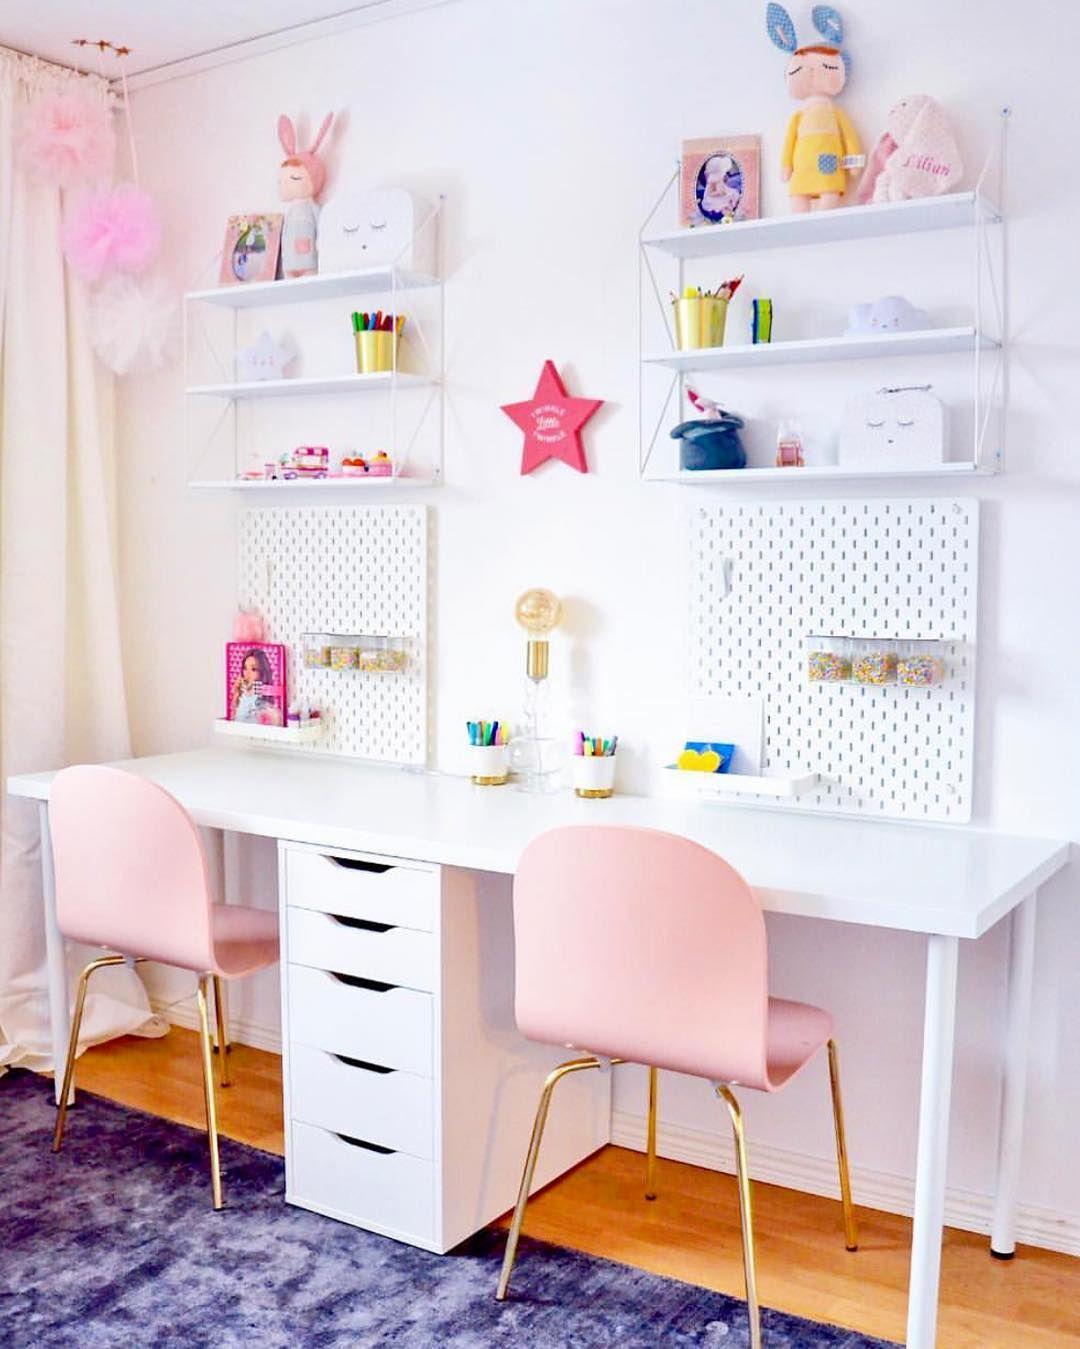 Project Junior On Instagram Cutest Double Desk Situation From Inspo By Israa Projectjunior Desk Kids Room Desk Shared Girls Bedroom Shared Girls Room